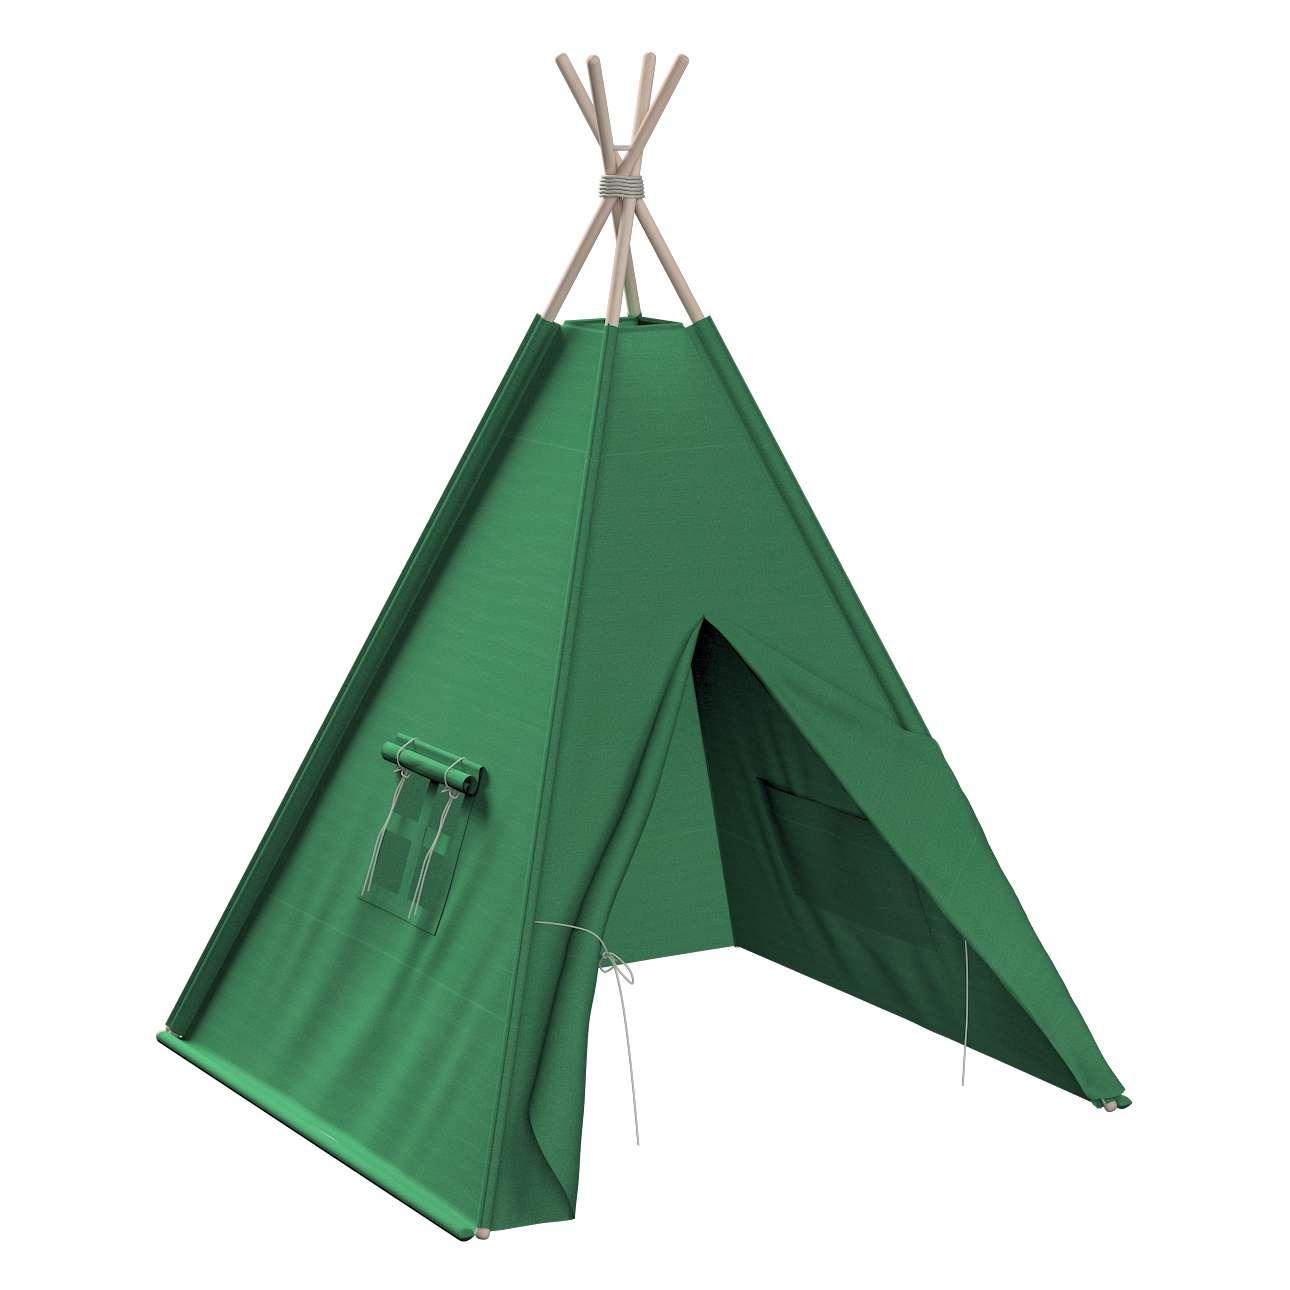 Tipi-Zelt von der Kollektion Happiness, Stoff: 133-18